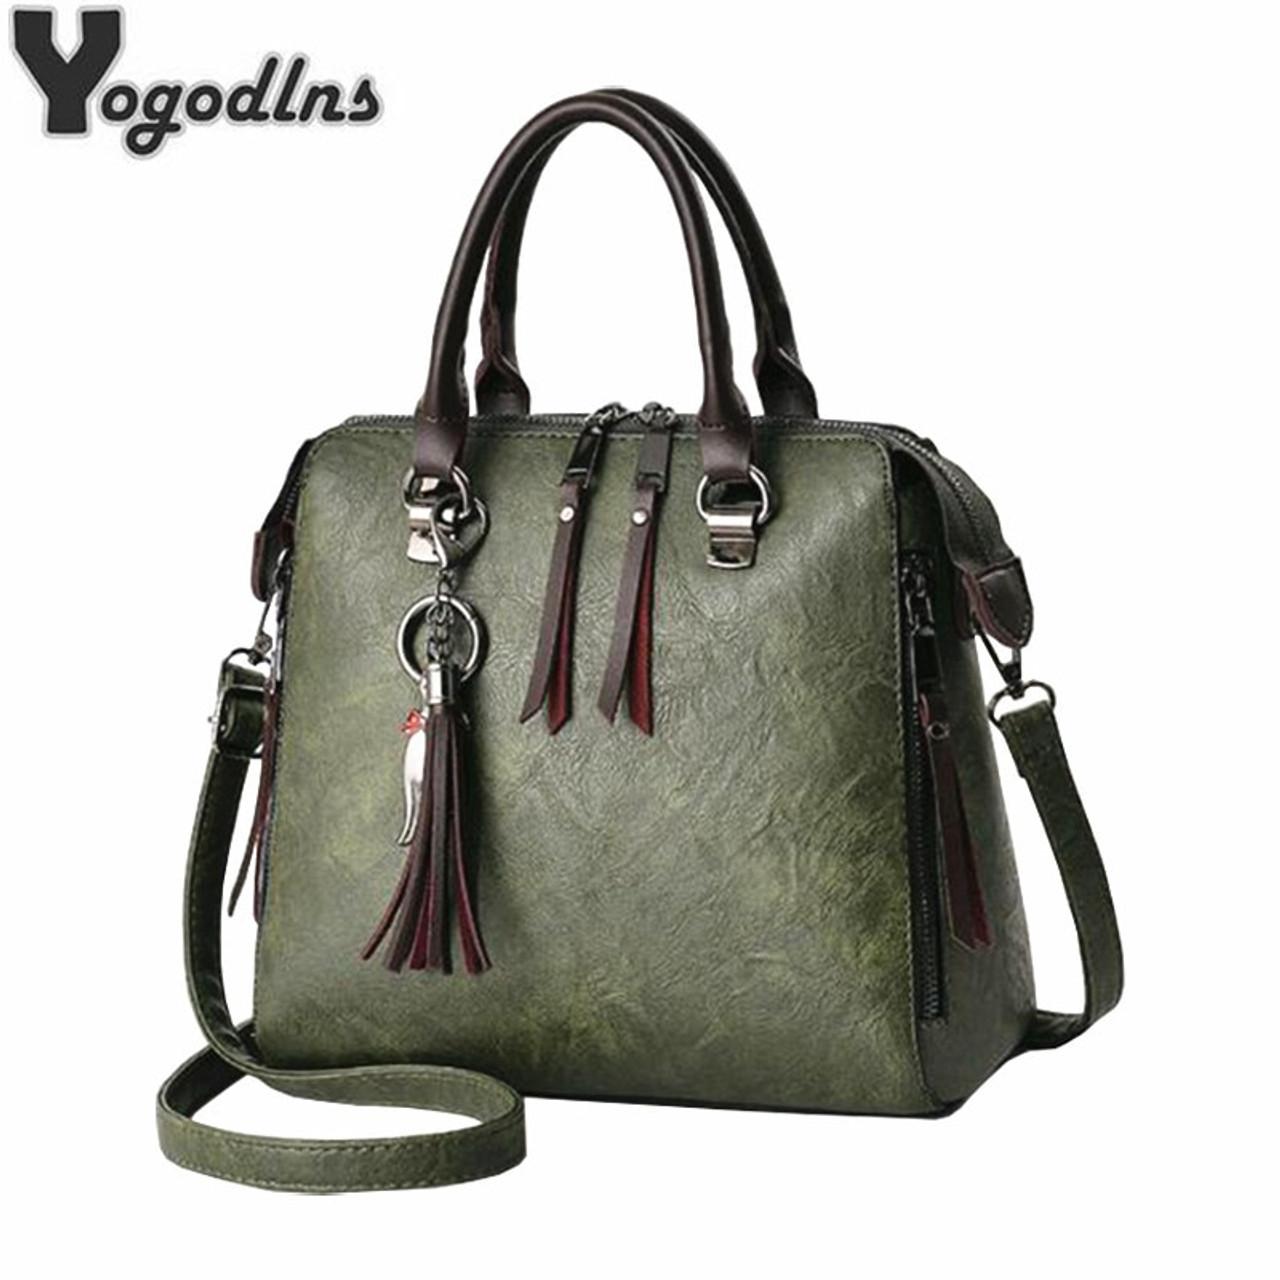 2949a2dd1 2019 Fashion Tassel Women Shoulder Bags Large Capacity Casual Leather Female  Handbag Rivet Zipper Crossbody Bags ...